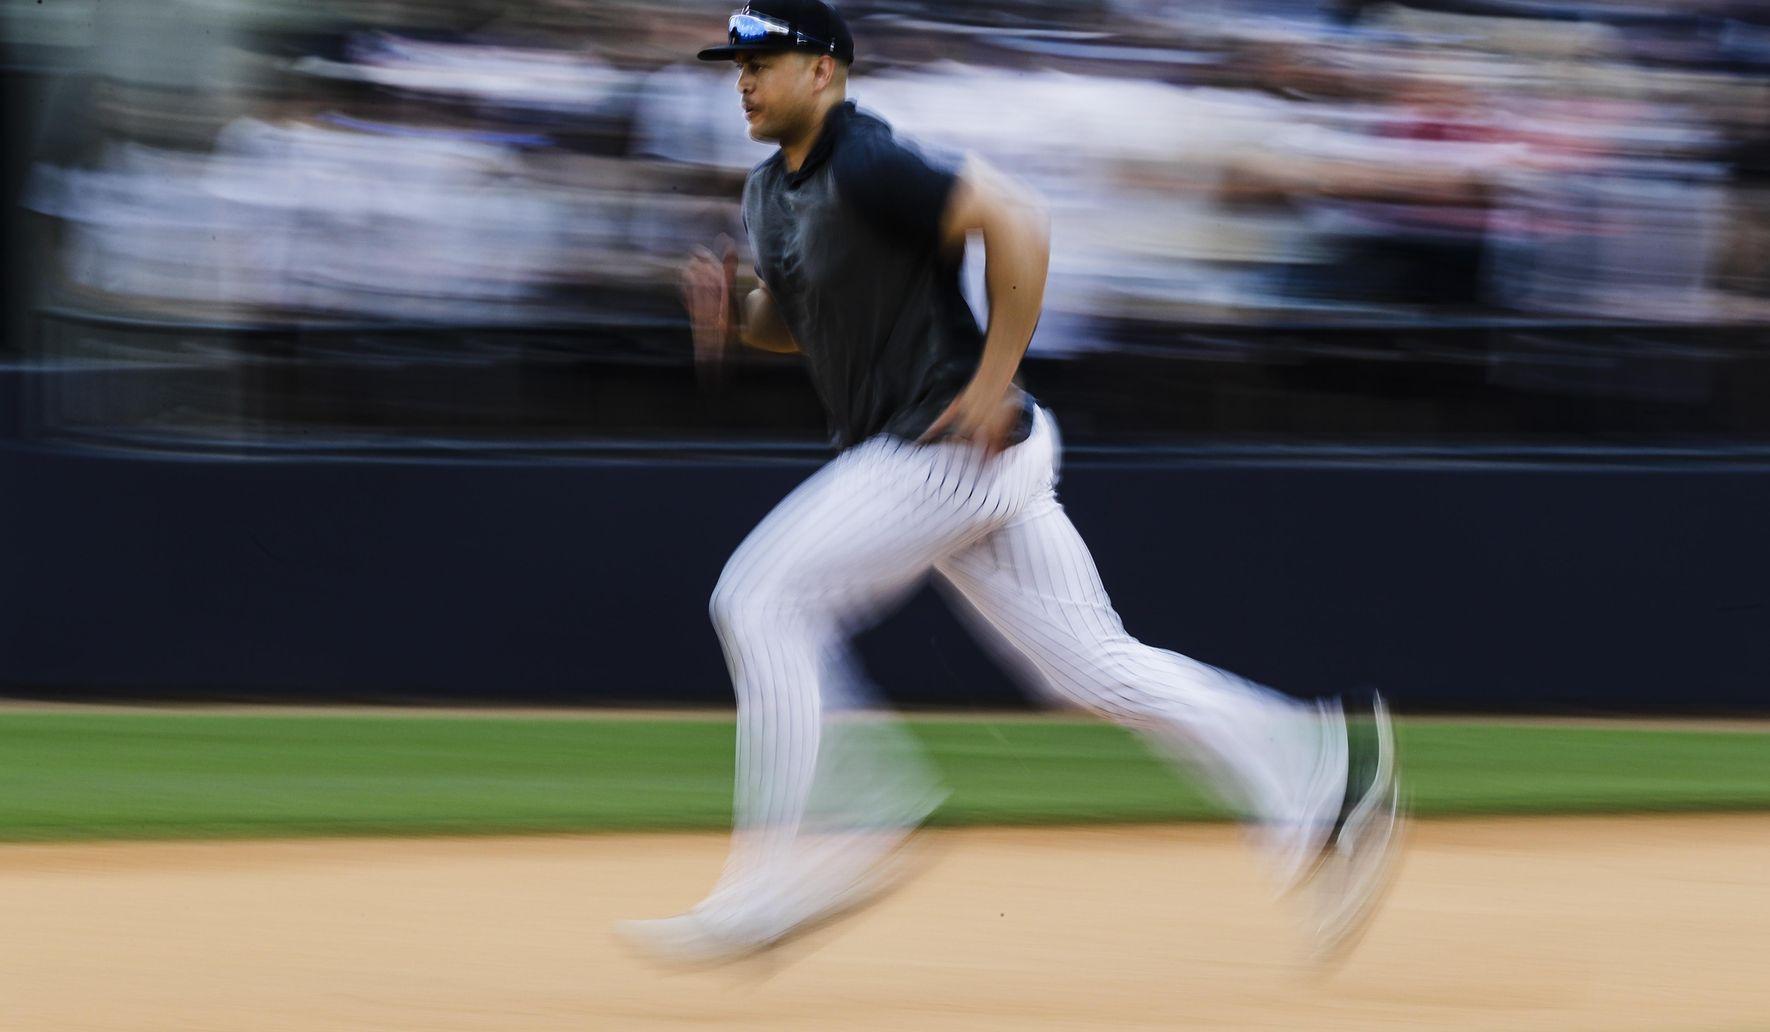 Yankees_spring_baseball_05238_c0-196-4688-2929_s1770x1032